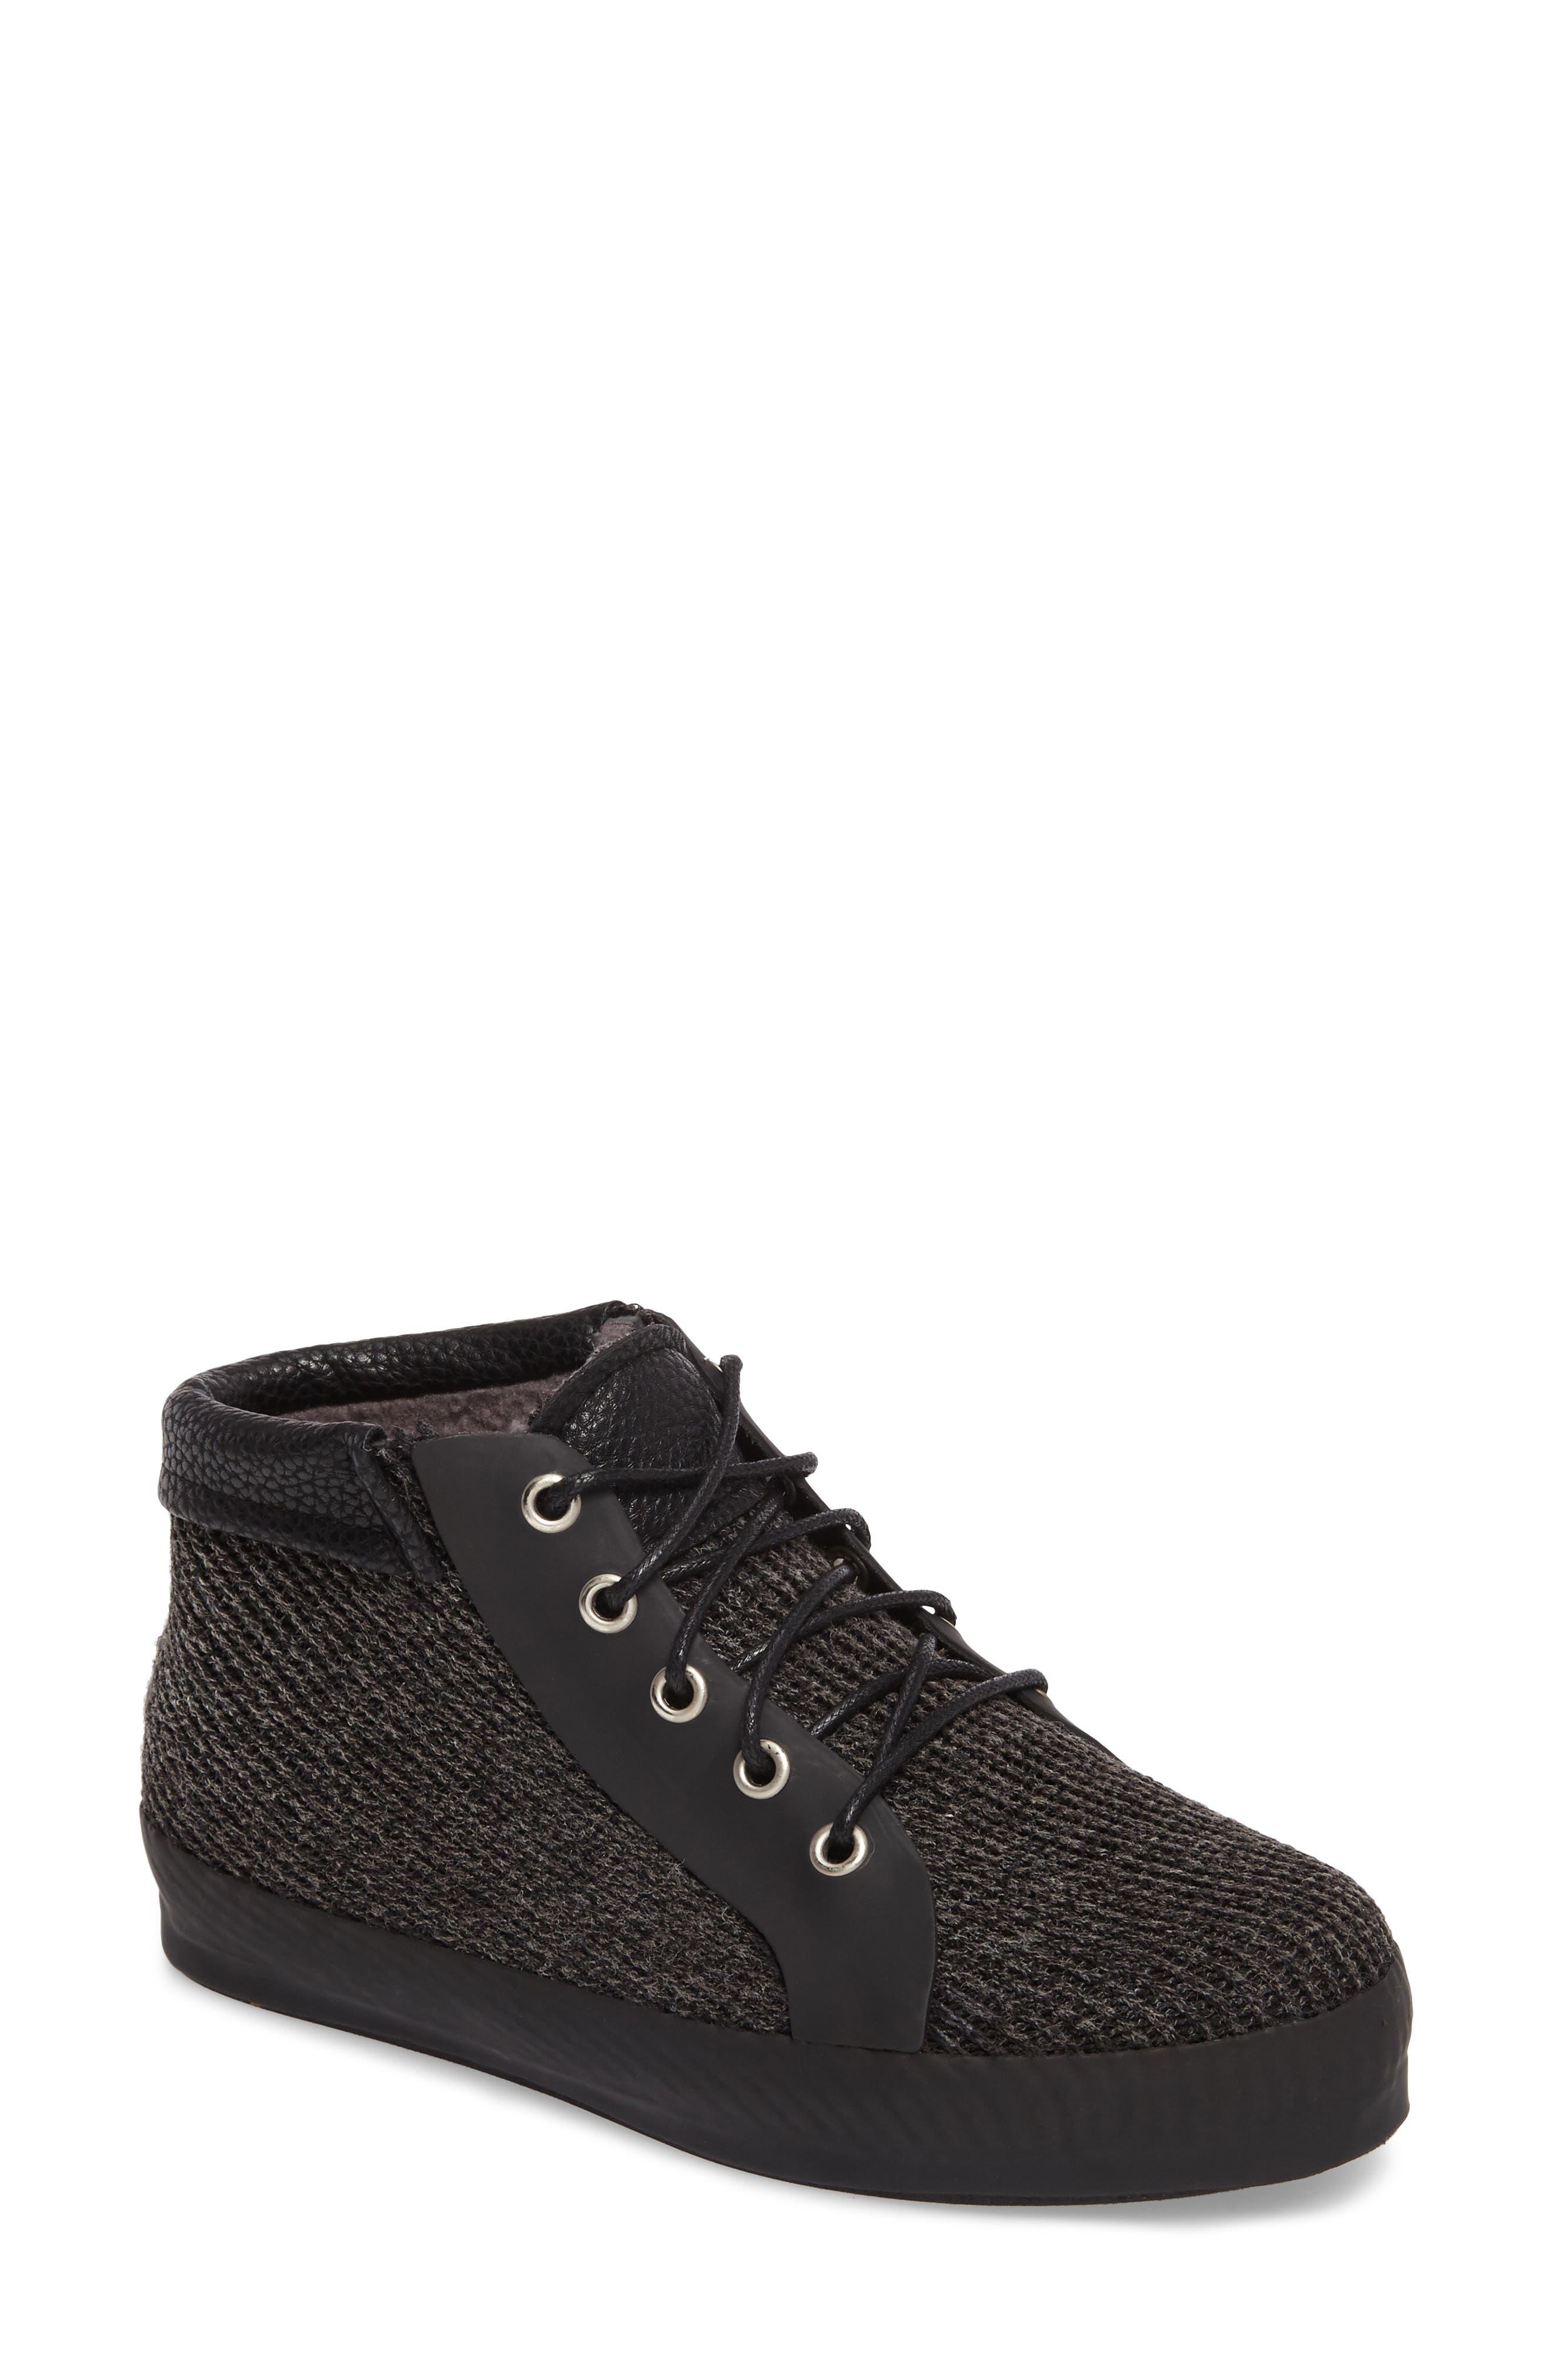 Hampton Waterproof Mid Sneaker,                         Main,                         color, Black Fabric